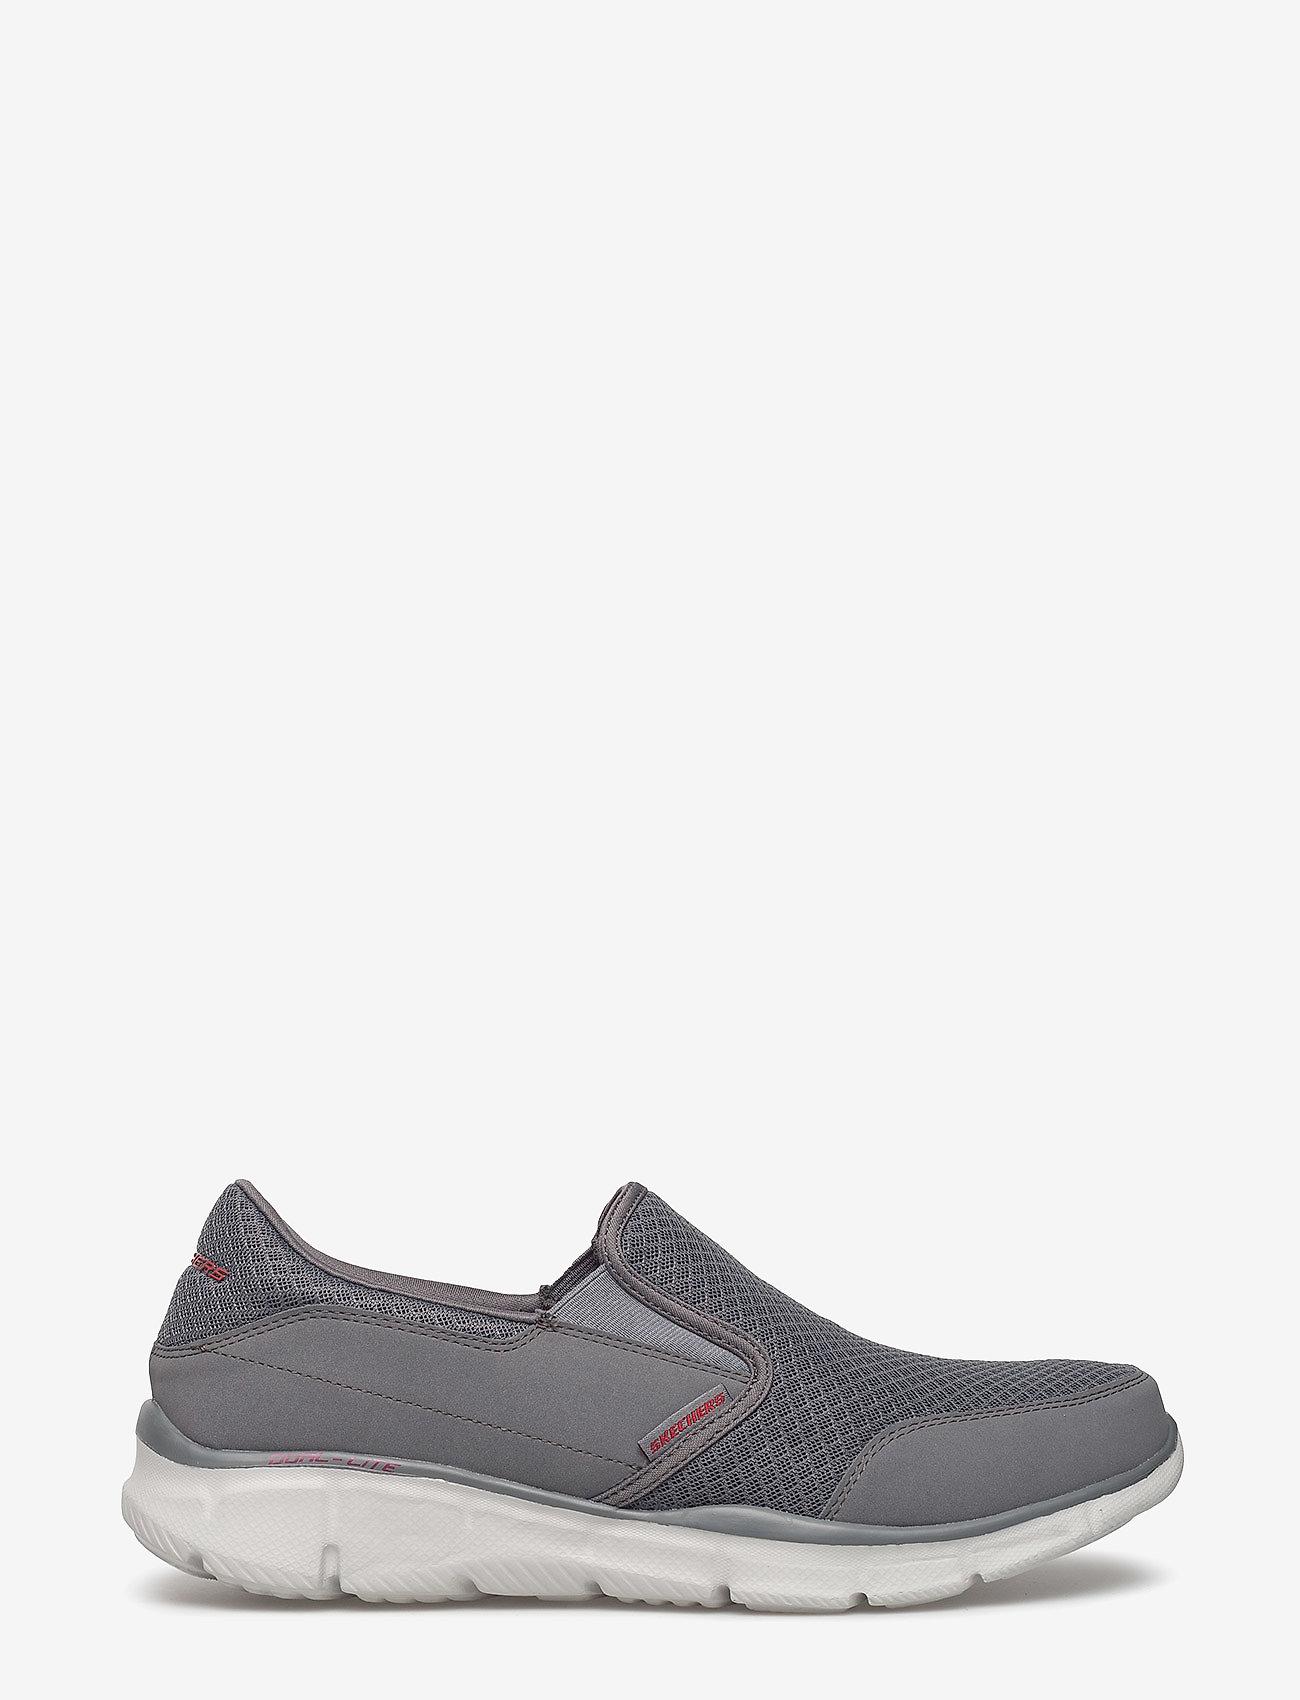 Skechers - Mens Equalizer Persistent - sportiska stila apavi bez aizdares - char charcoal - 1